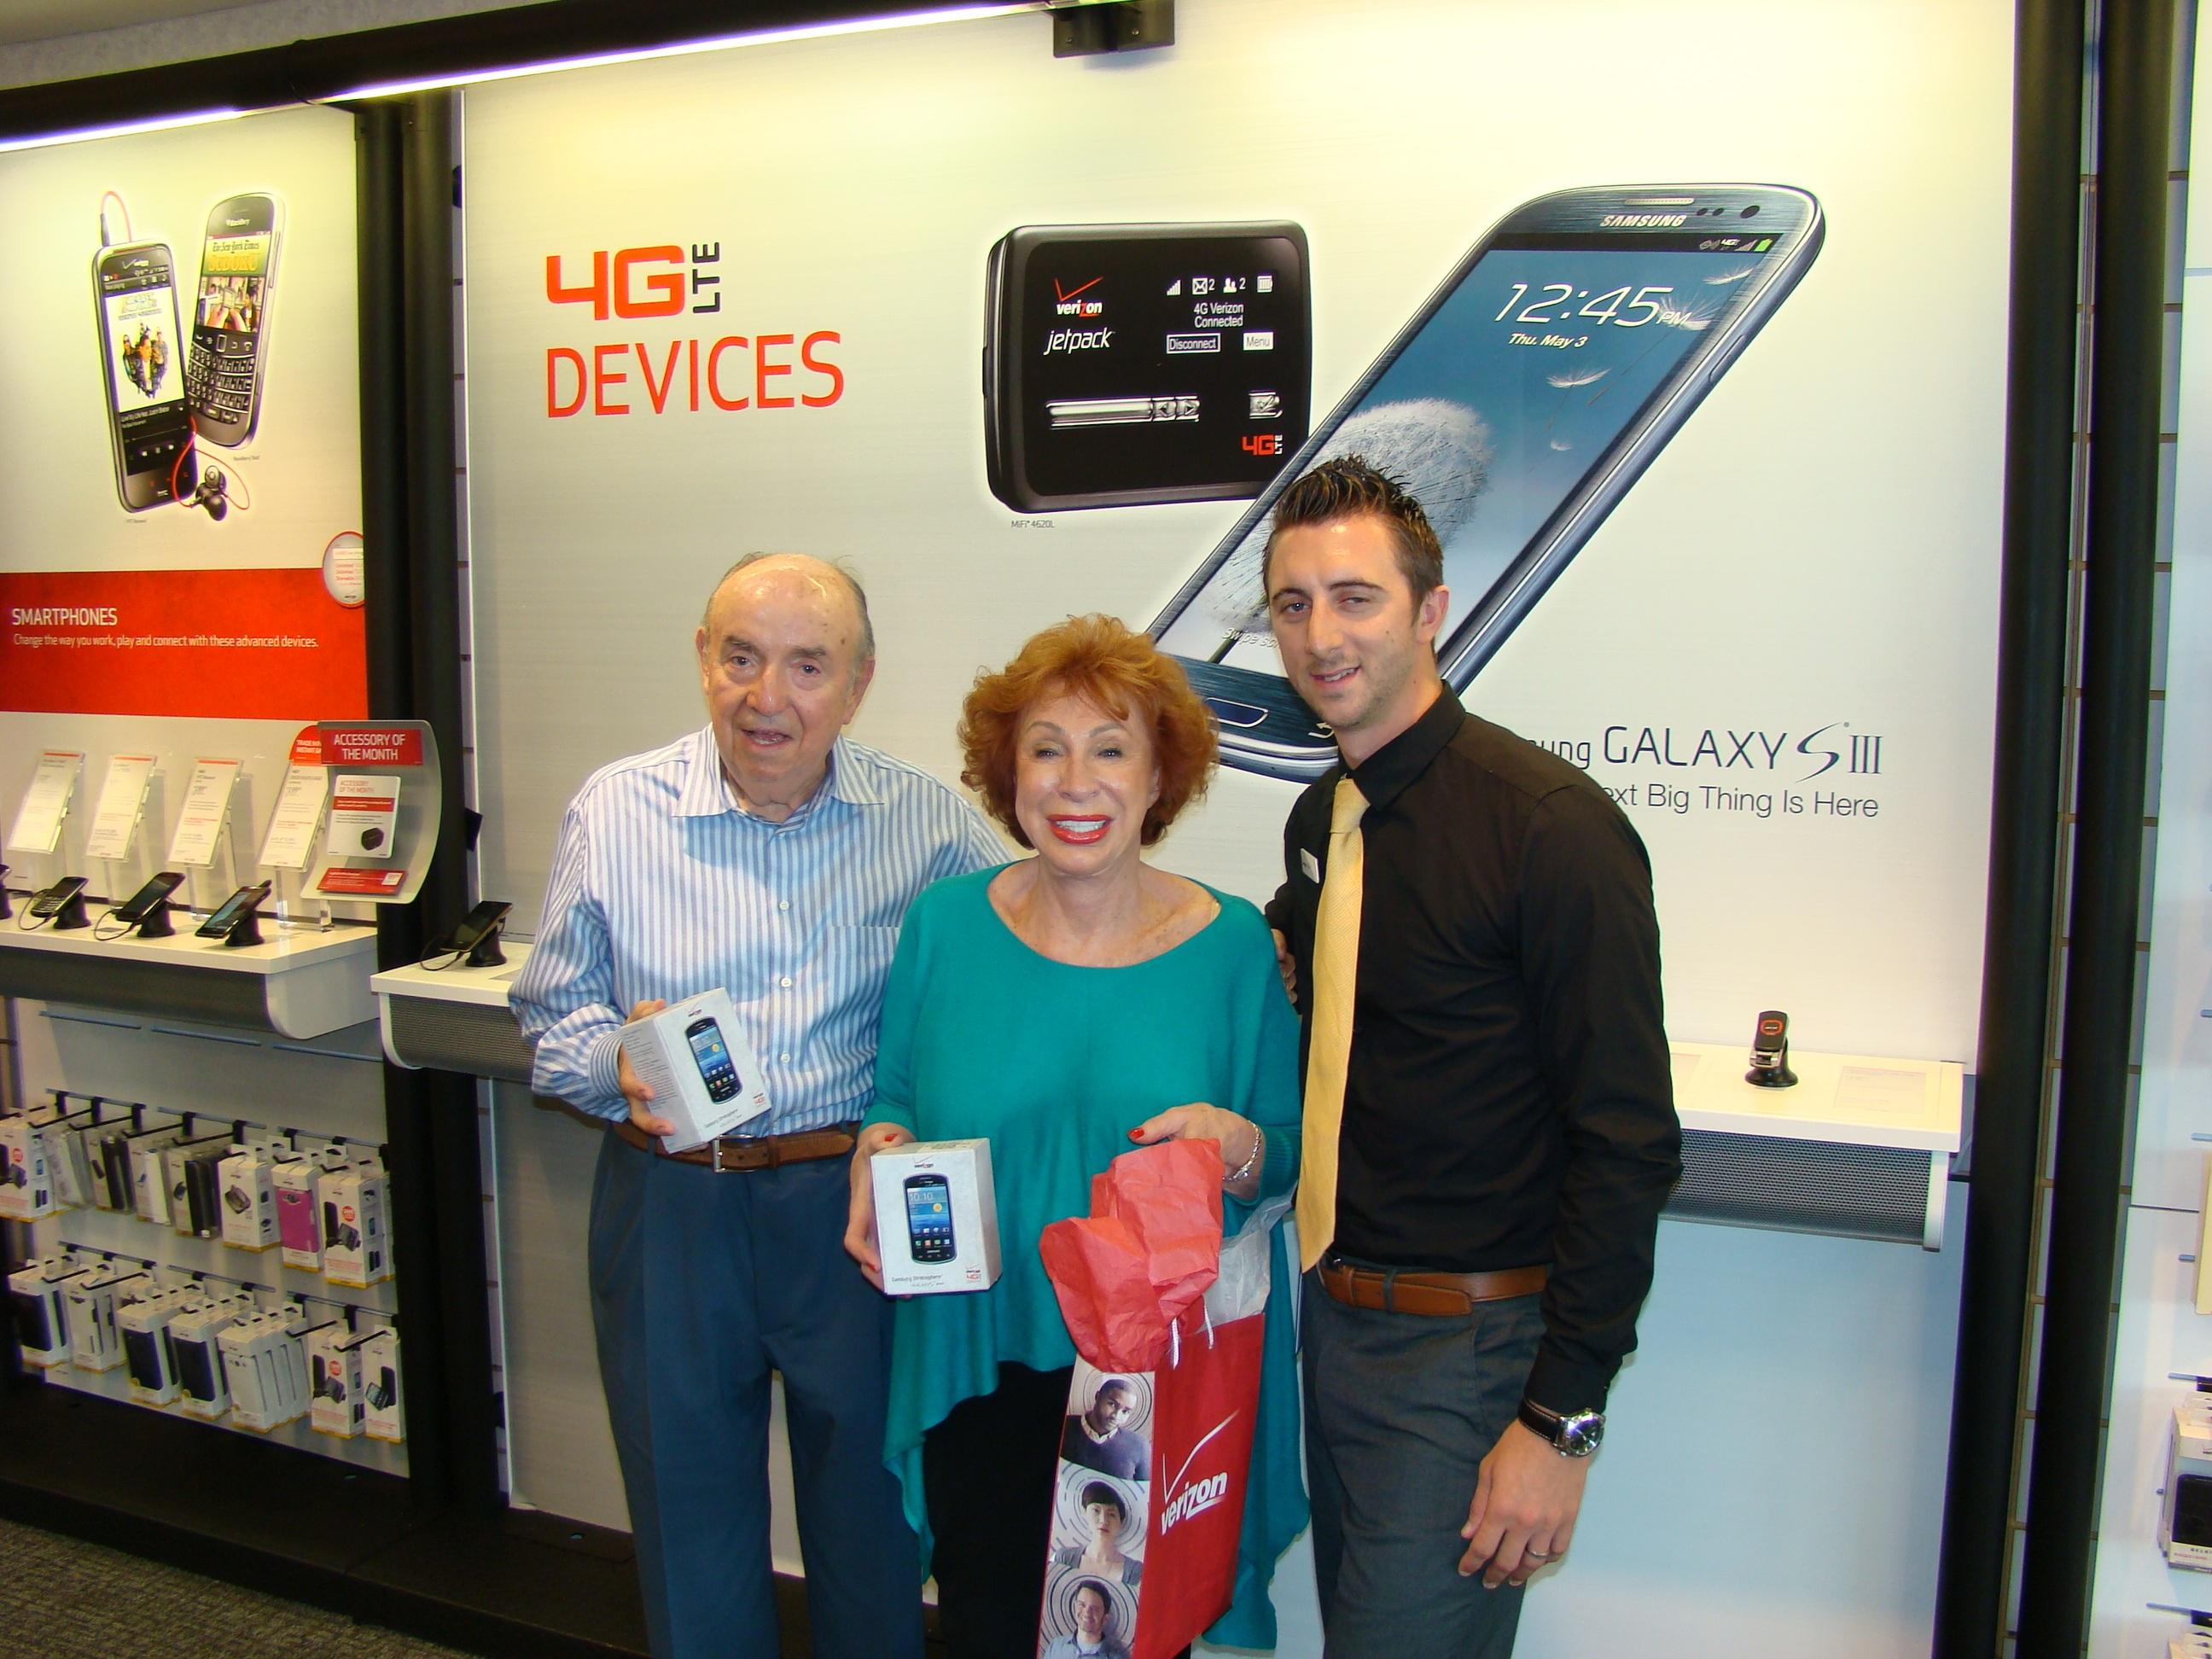 Boca Raton Newlyweds Meet At Verizon Store